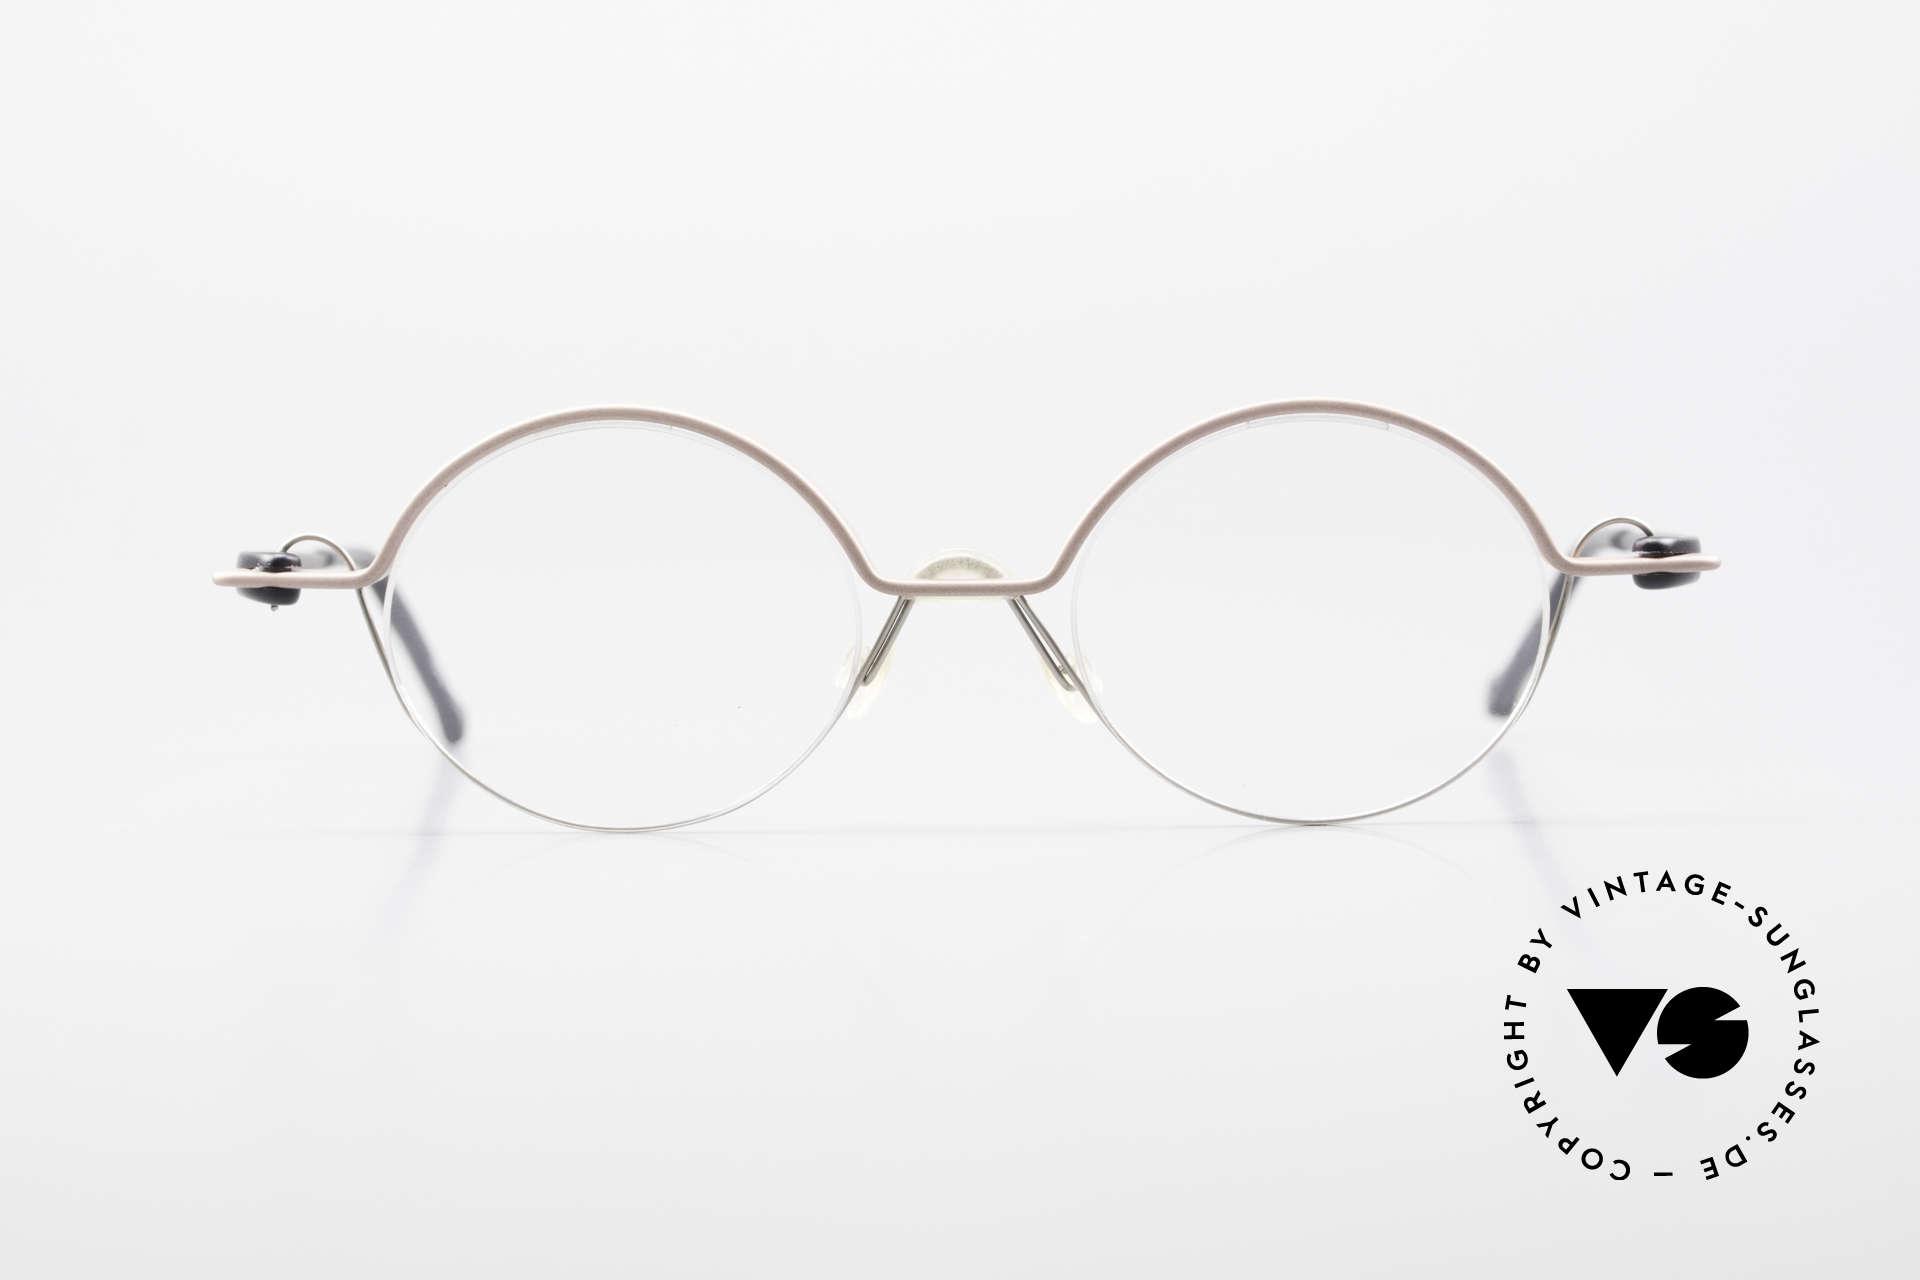 ProDesign No23 Gail Spence Design Frame 90's, true vintage aluminium frame - Gail Spence Design, Made for Men and Women